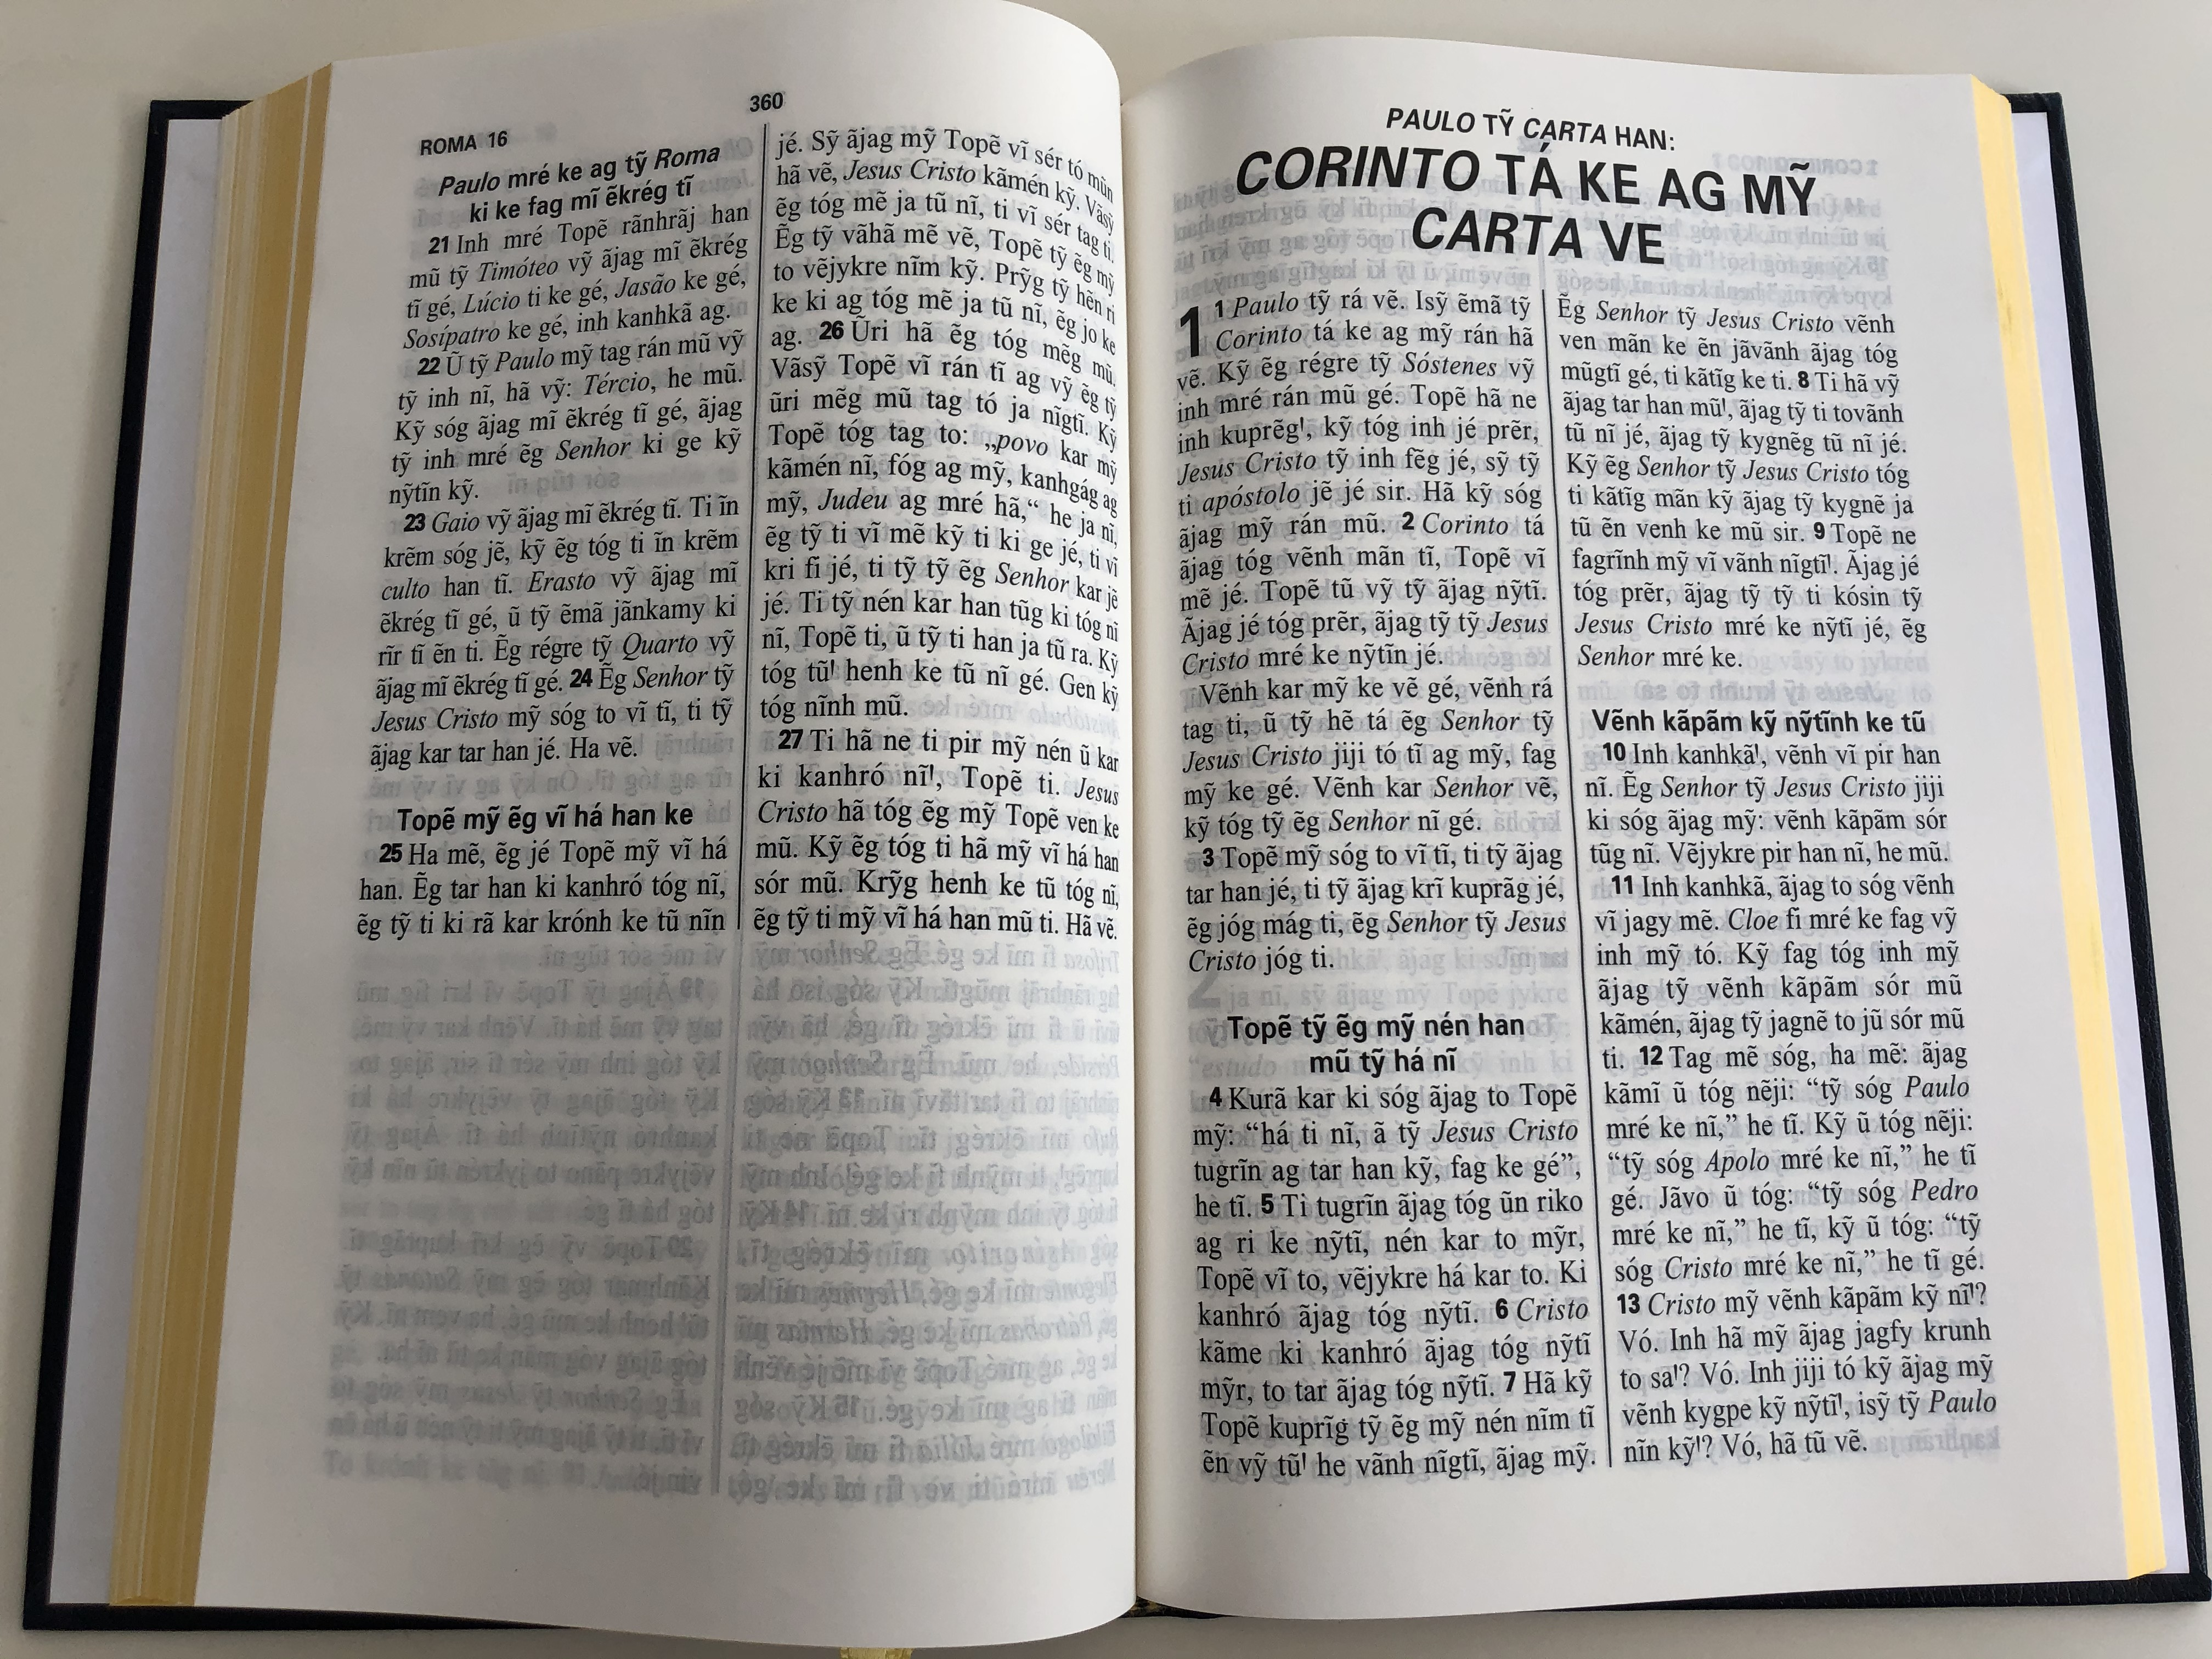 top-v-r-o-novo-testamento-the-new-testament-in-kaingang-language-bible-society-brasil-2005-hardcover-2nd-edition-8-.jpg